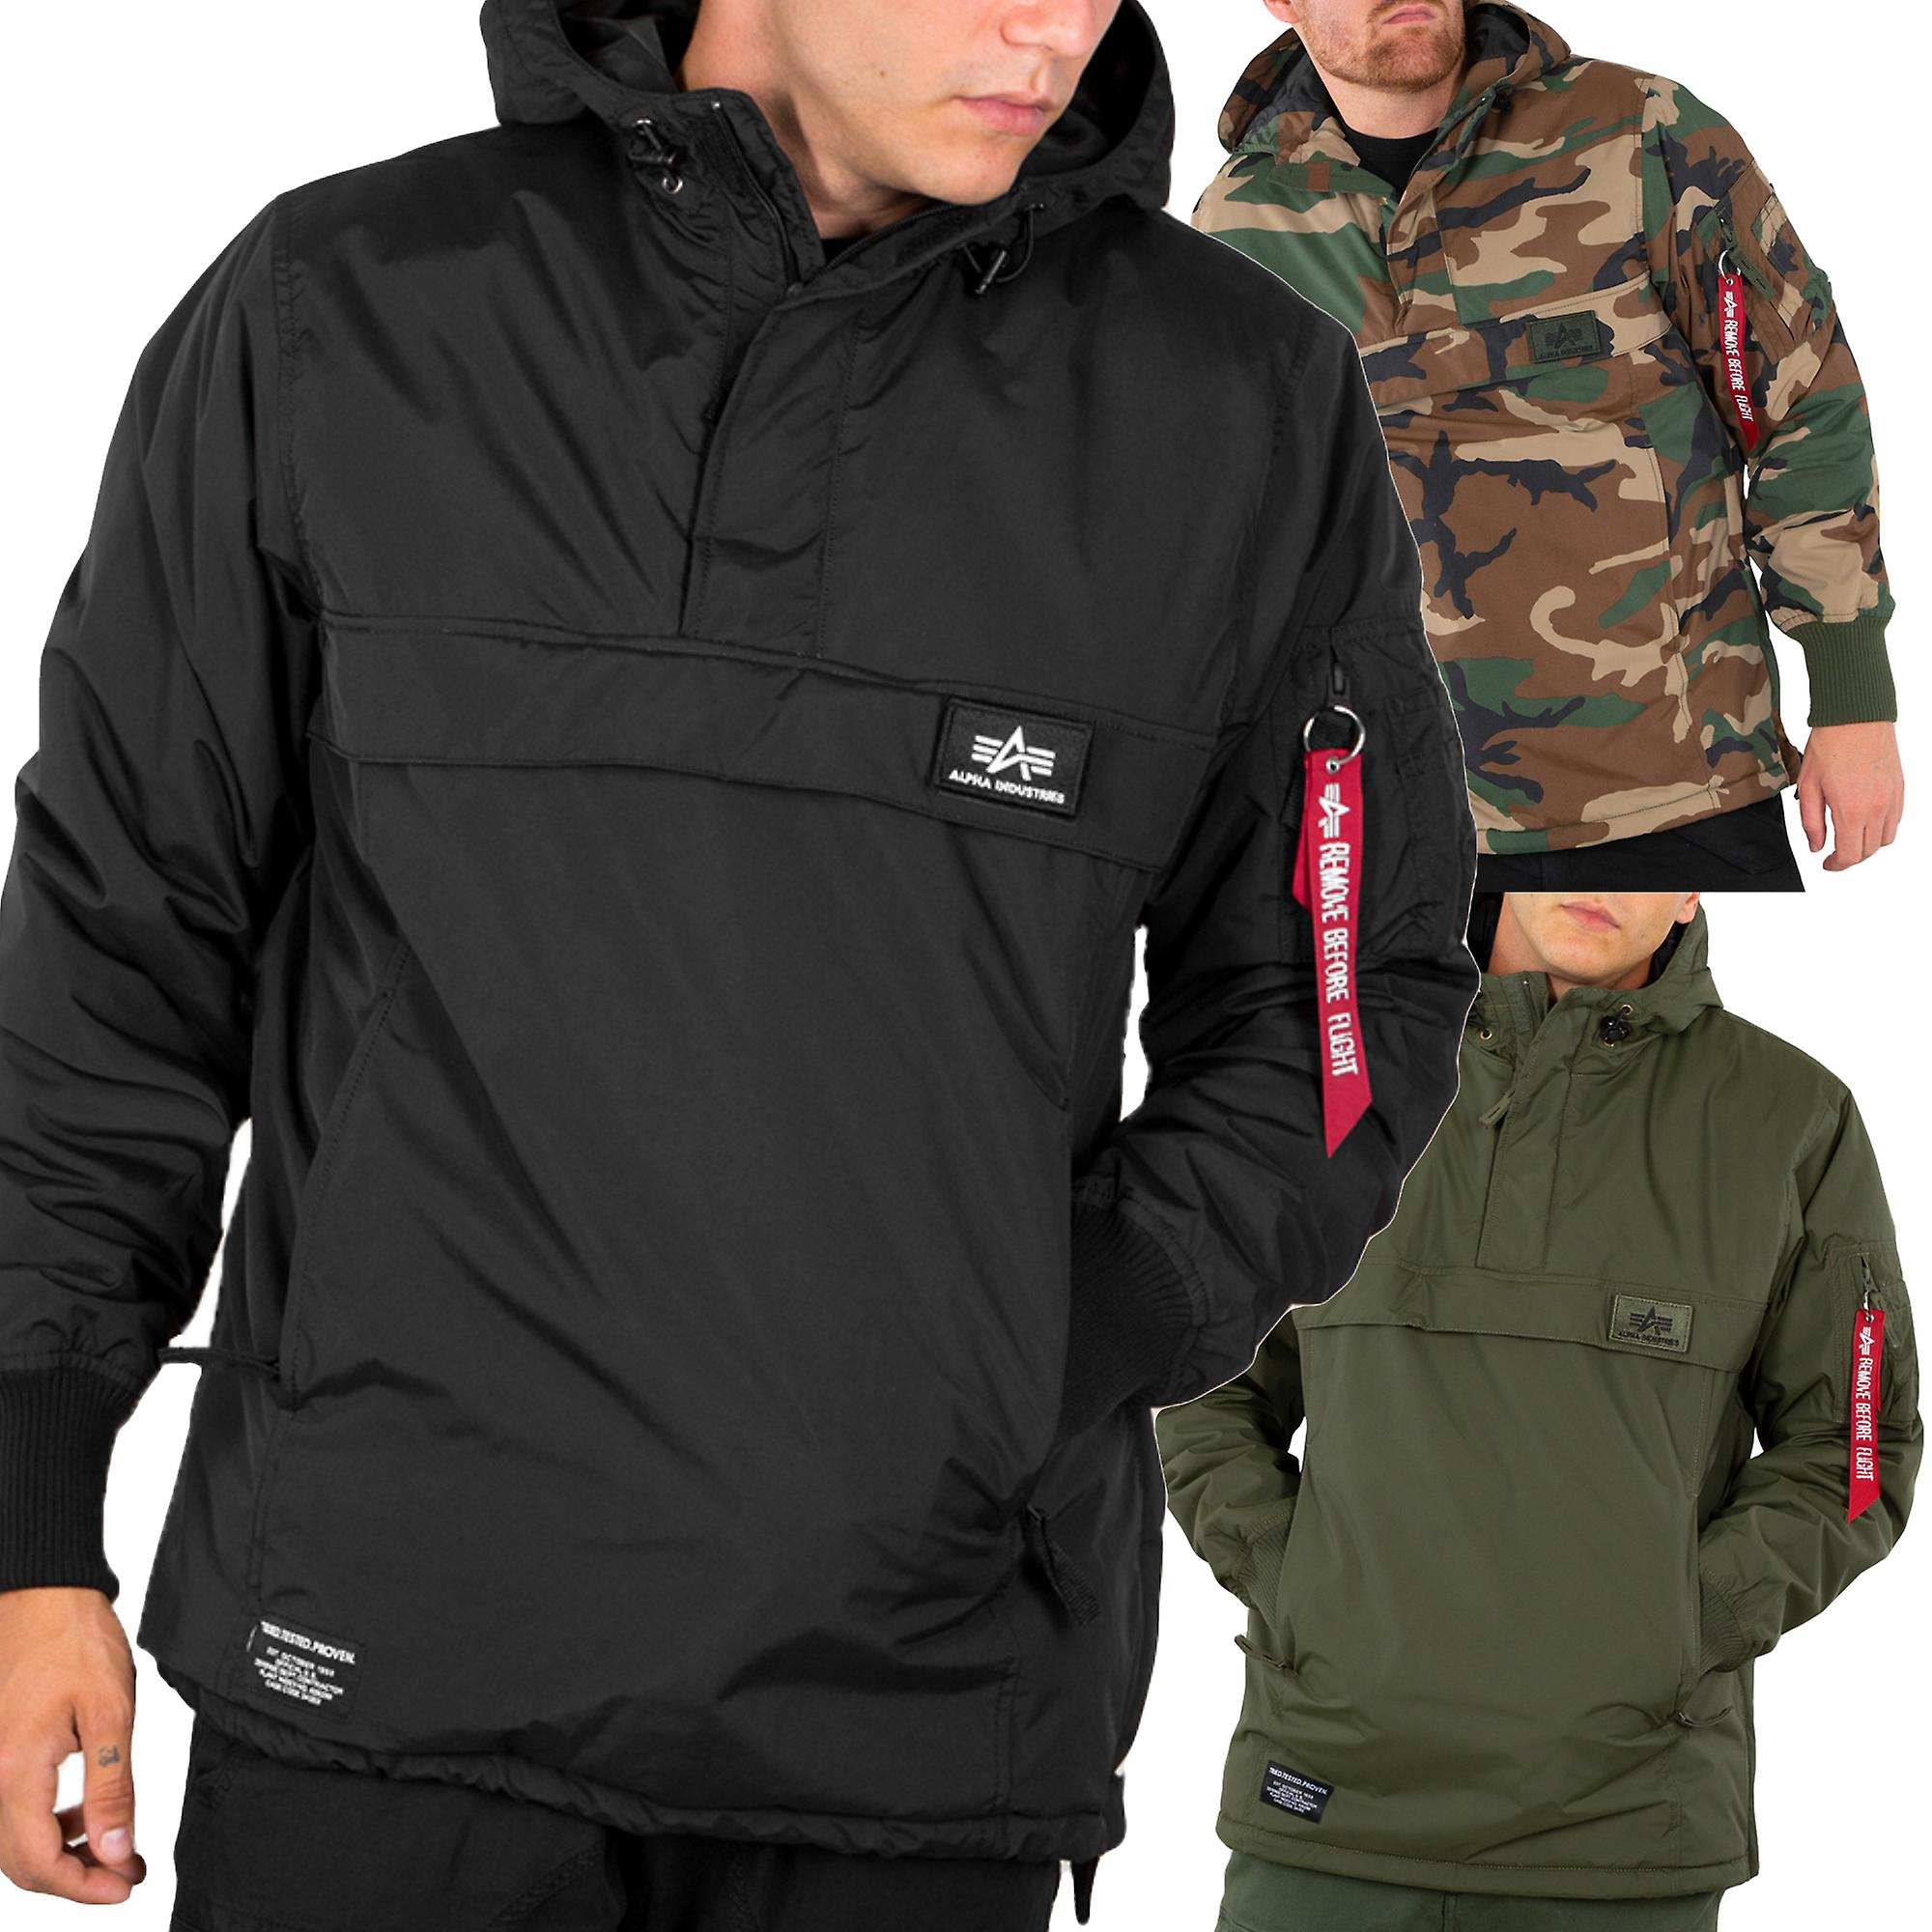 quality design 7a5f5 8cf3f Alpha industries men's winter jacket WP anorak